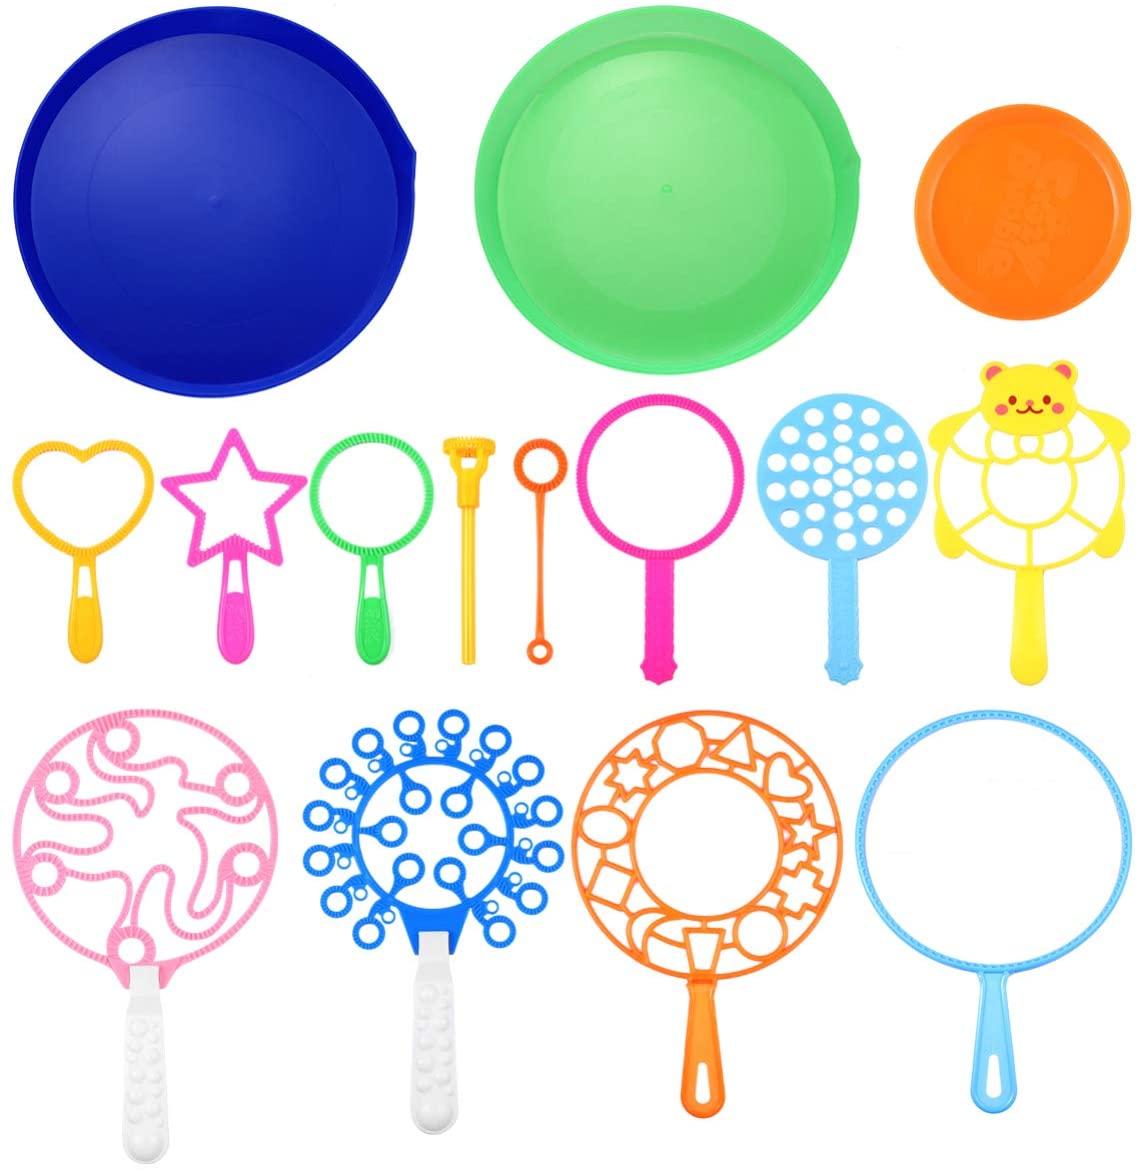 LIOOBO 15PCS Blowing Bubble Blowers Ring Toys Bubble Wand Sets Bubble Makers Toys for Kids Boys Girls,Random Color